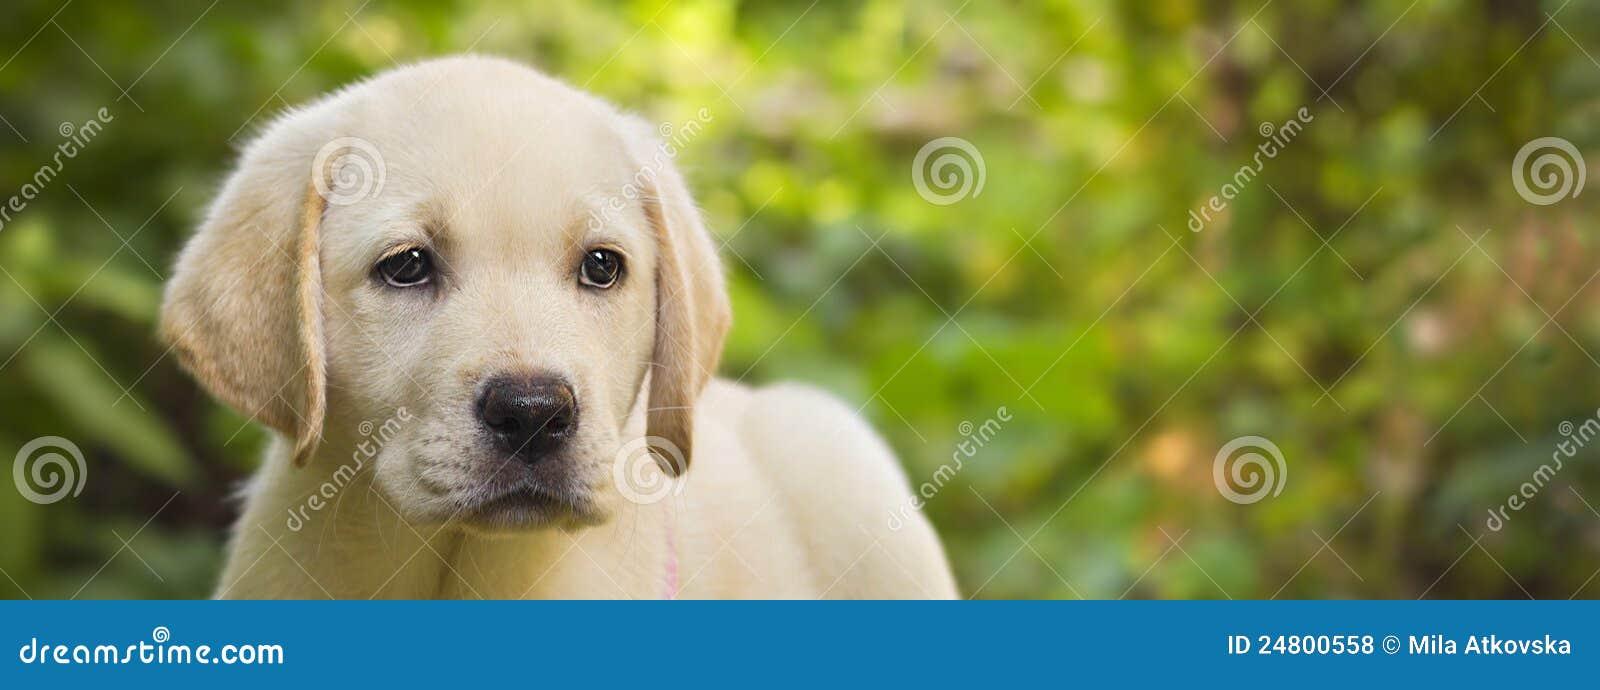 Labrador retriever puppy in the yard banner